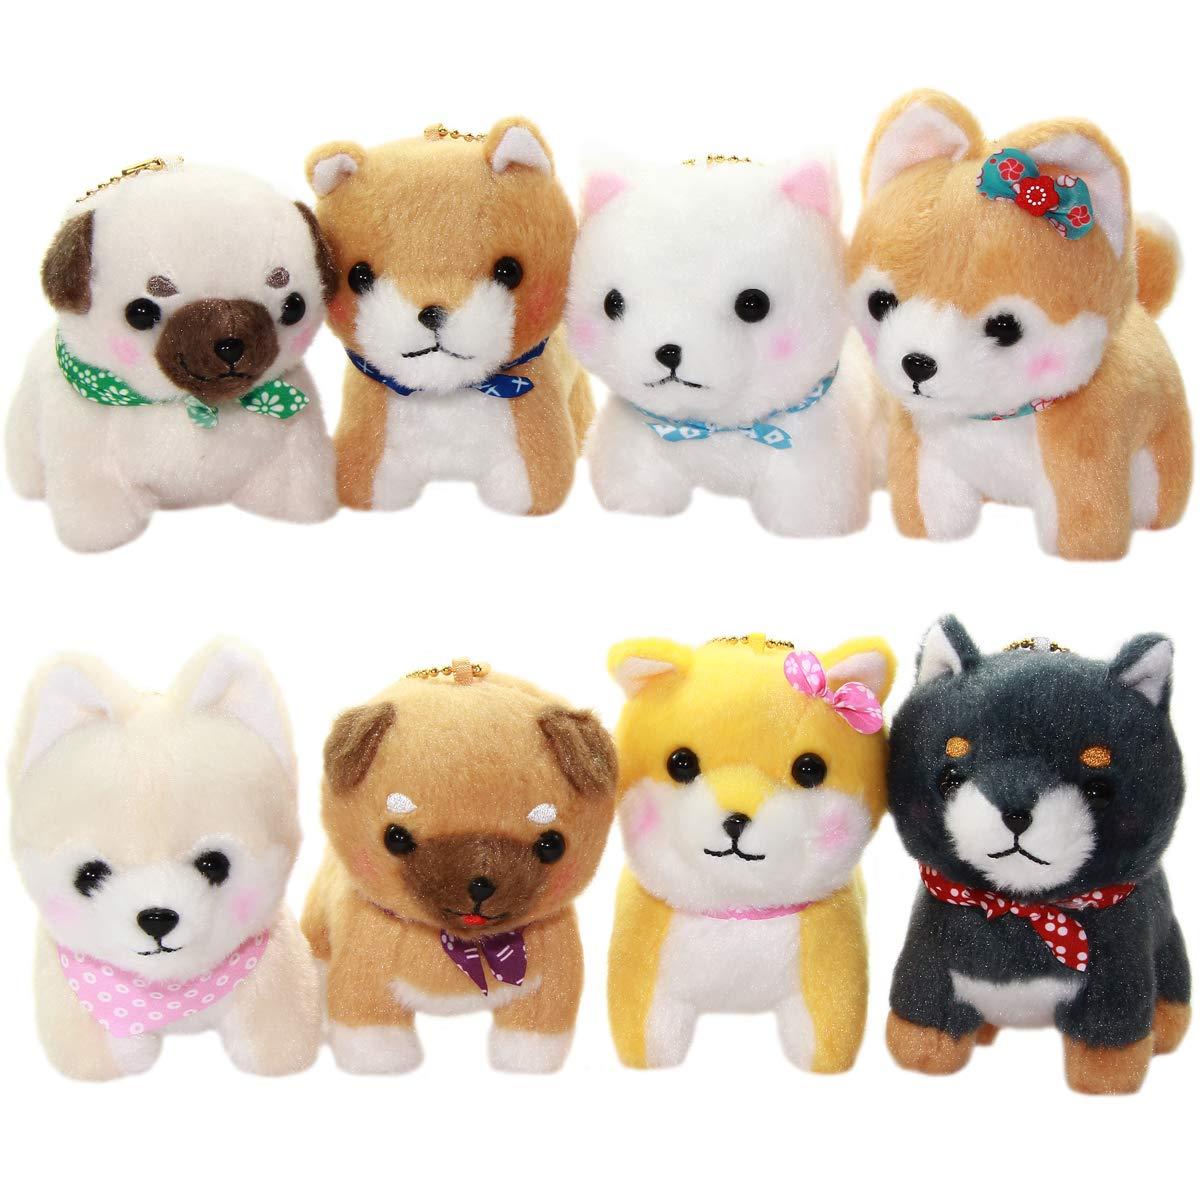 Amuse Black Dog Plush Doll Stuffed Animal Keychain Mamejiro Ball Chain Size